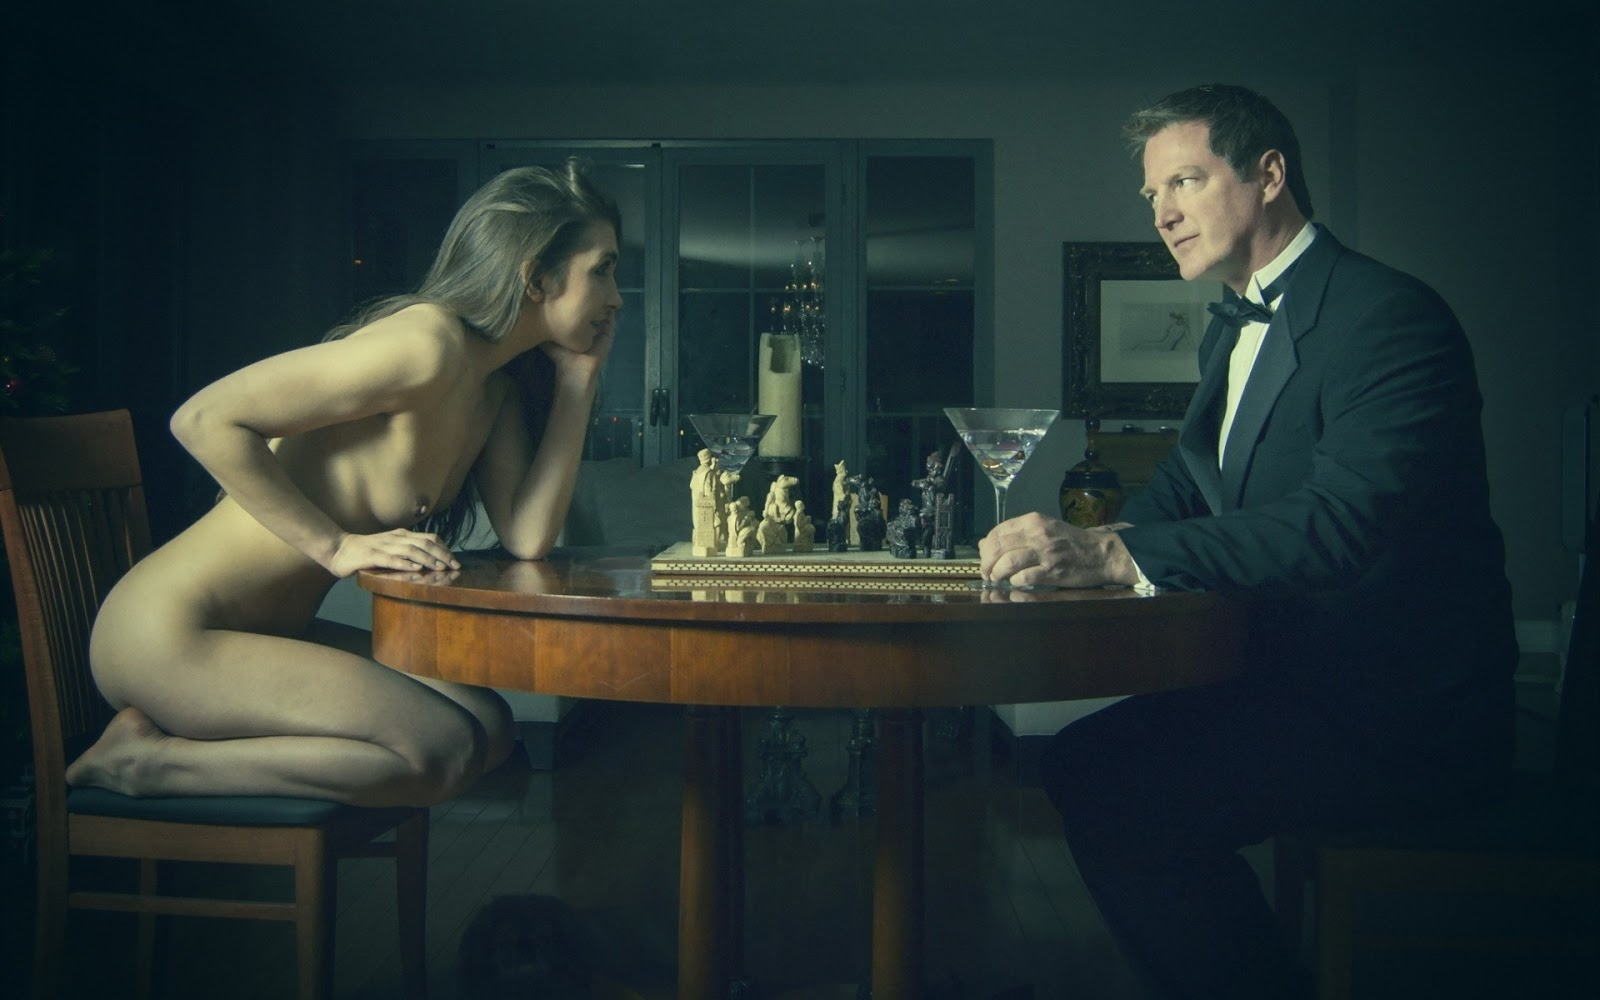 Мужчина и женшина которые делают секс